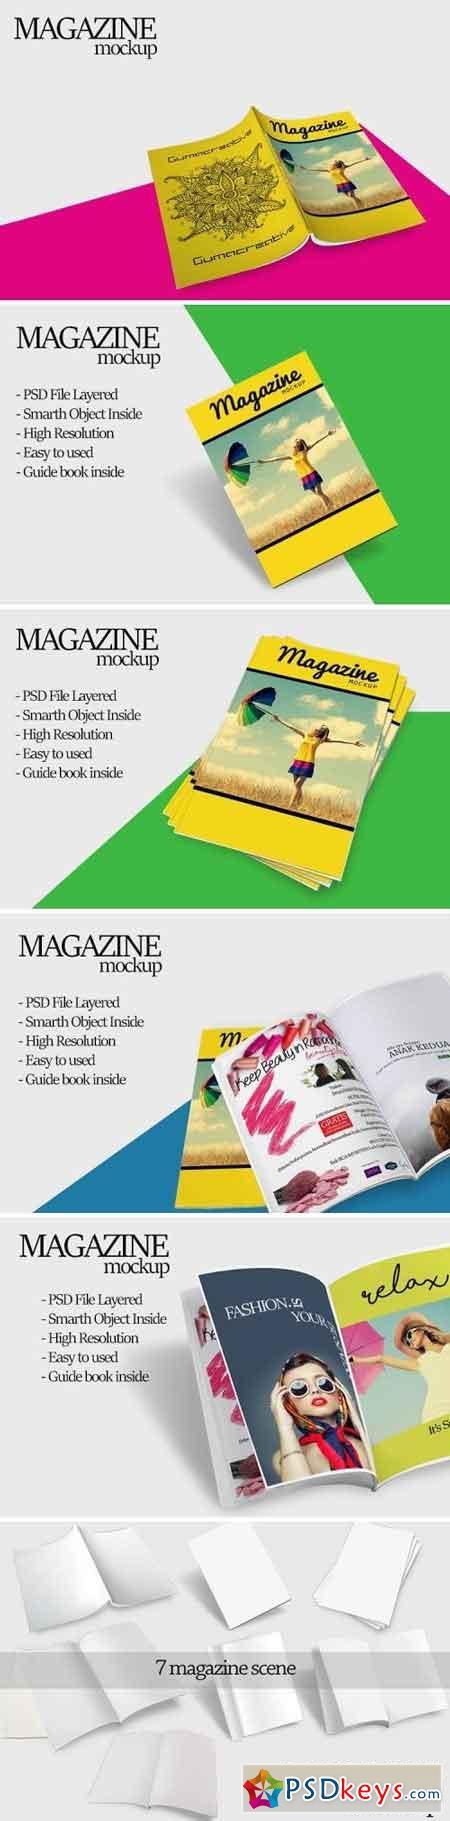 Magazine Mockup 1577270